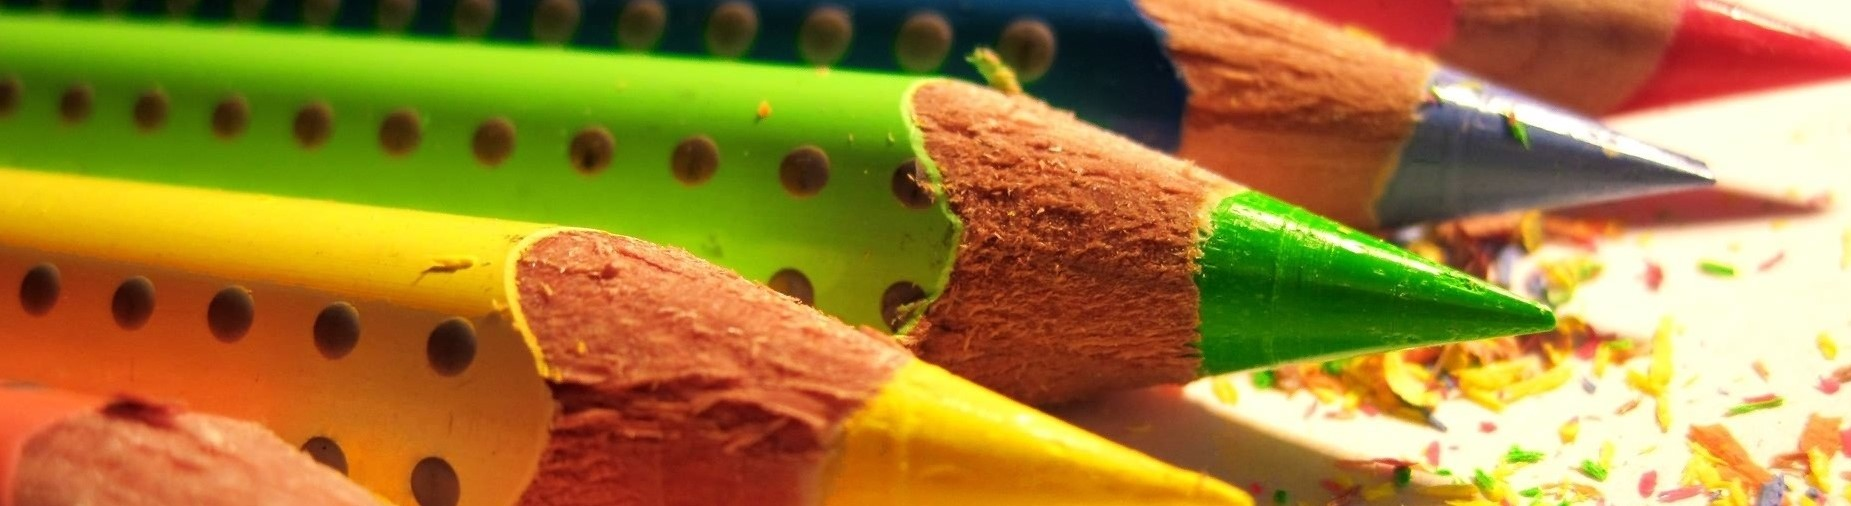 Kleurplaten Phineas Ferb Uitprinten.Kids N Fun Alle Kleurplaten